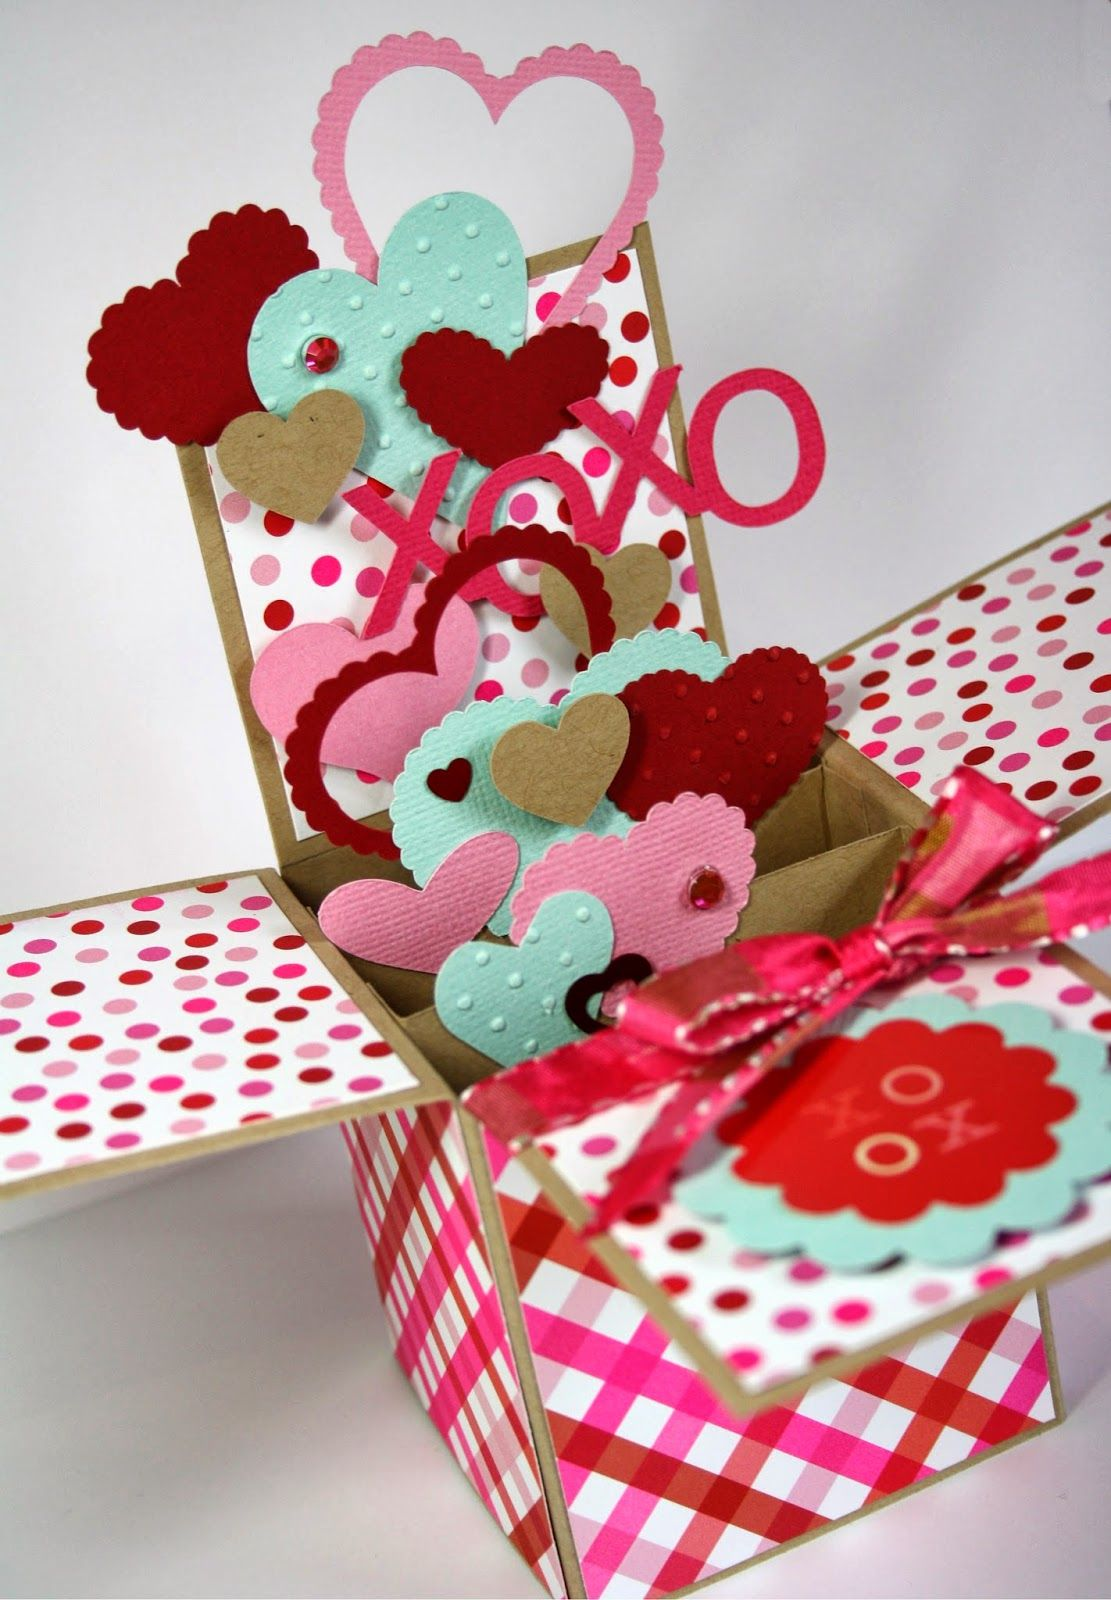 httpscrappingoutsidethelinesblogspotcoil201402valentine – Valentines Card Pop Up